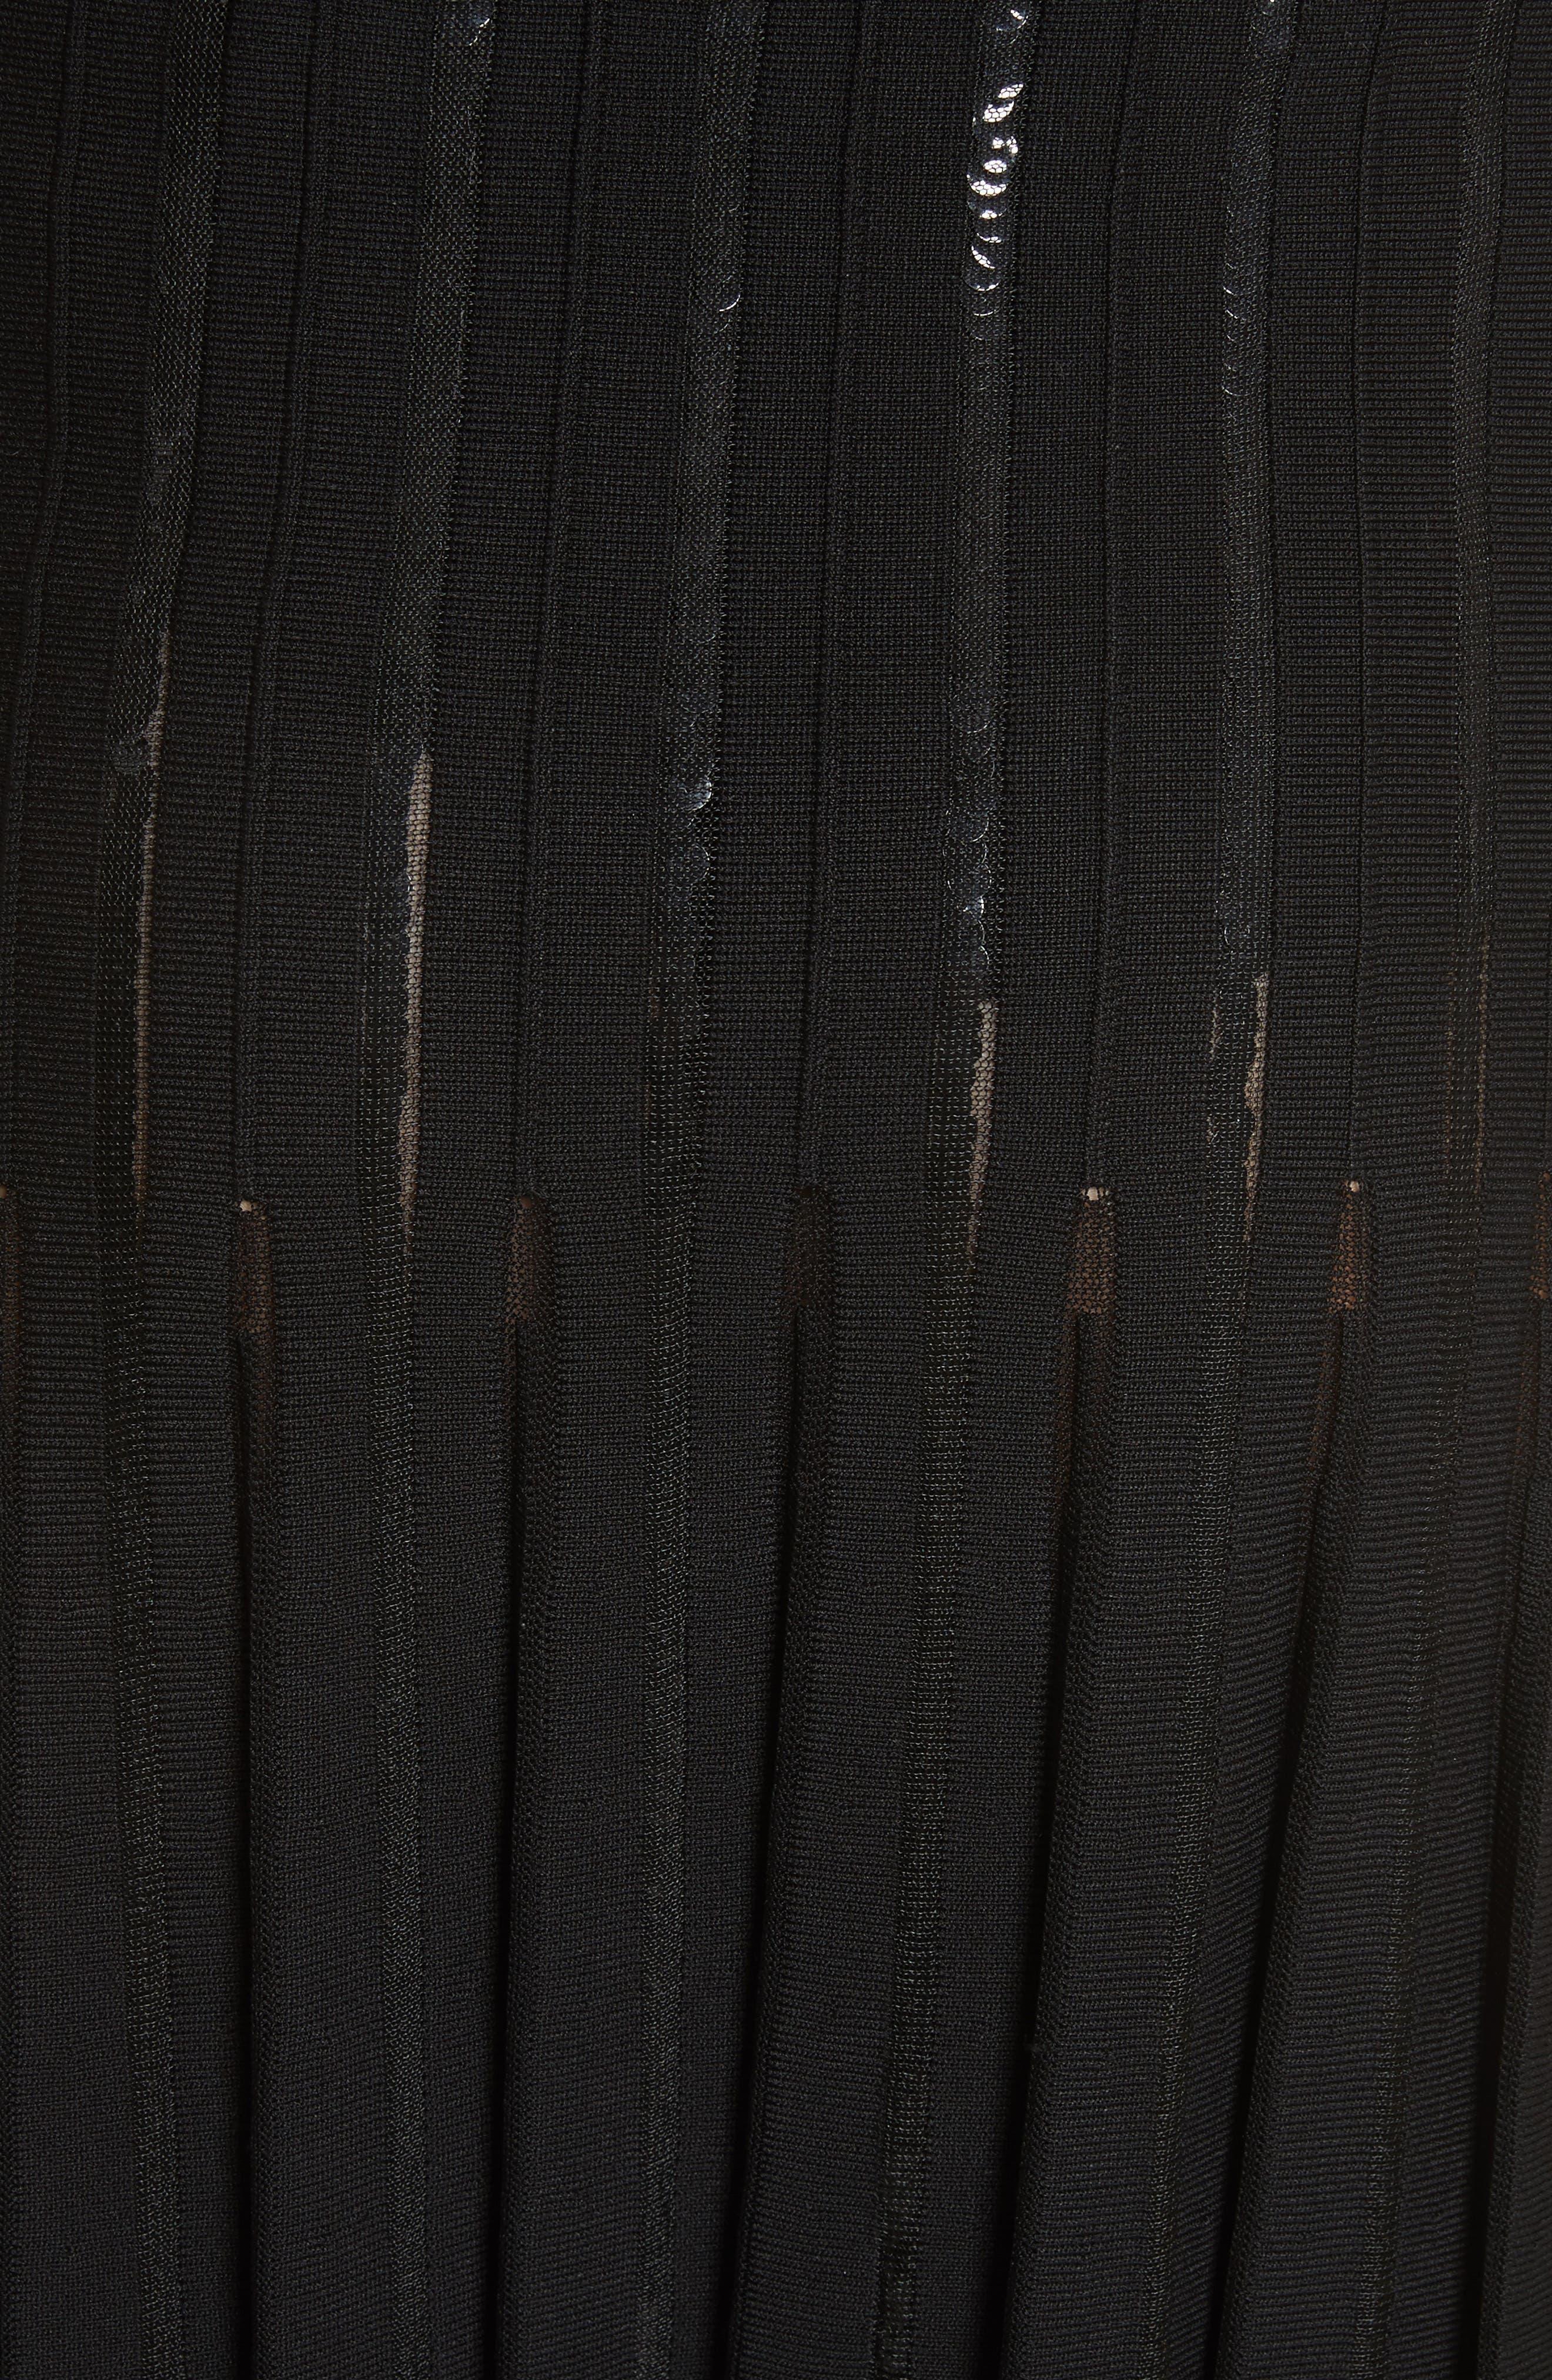 Pleated Sequin Flare Skirt,                             Alternate thumbnail 6, color,                             Black